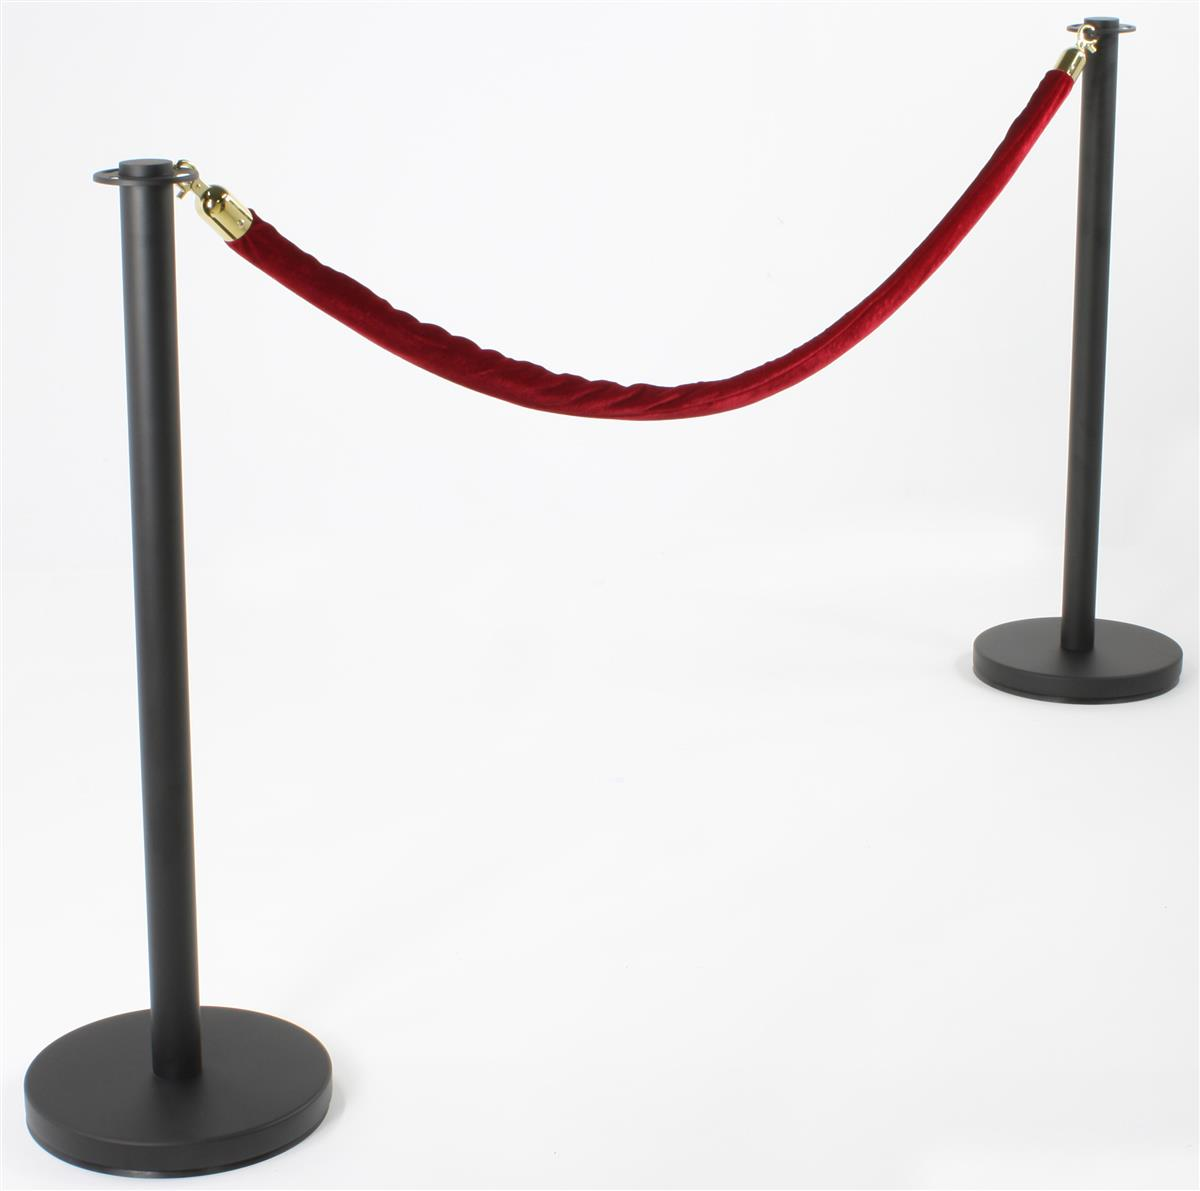 Stanchions For Sale >> Set of (2) Stanchion Posts - Burgundy Velvet Ropes